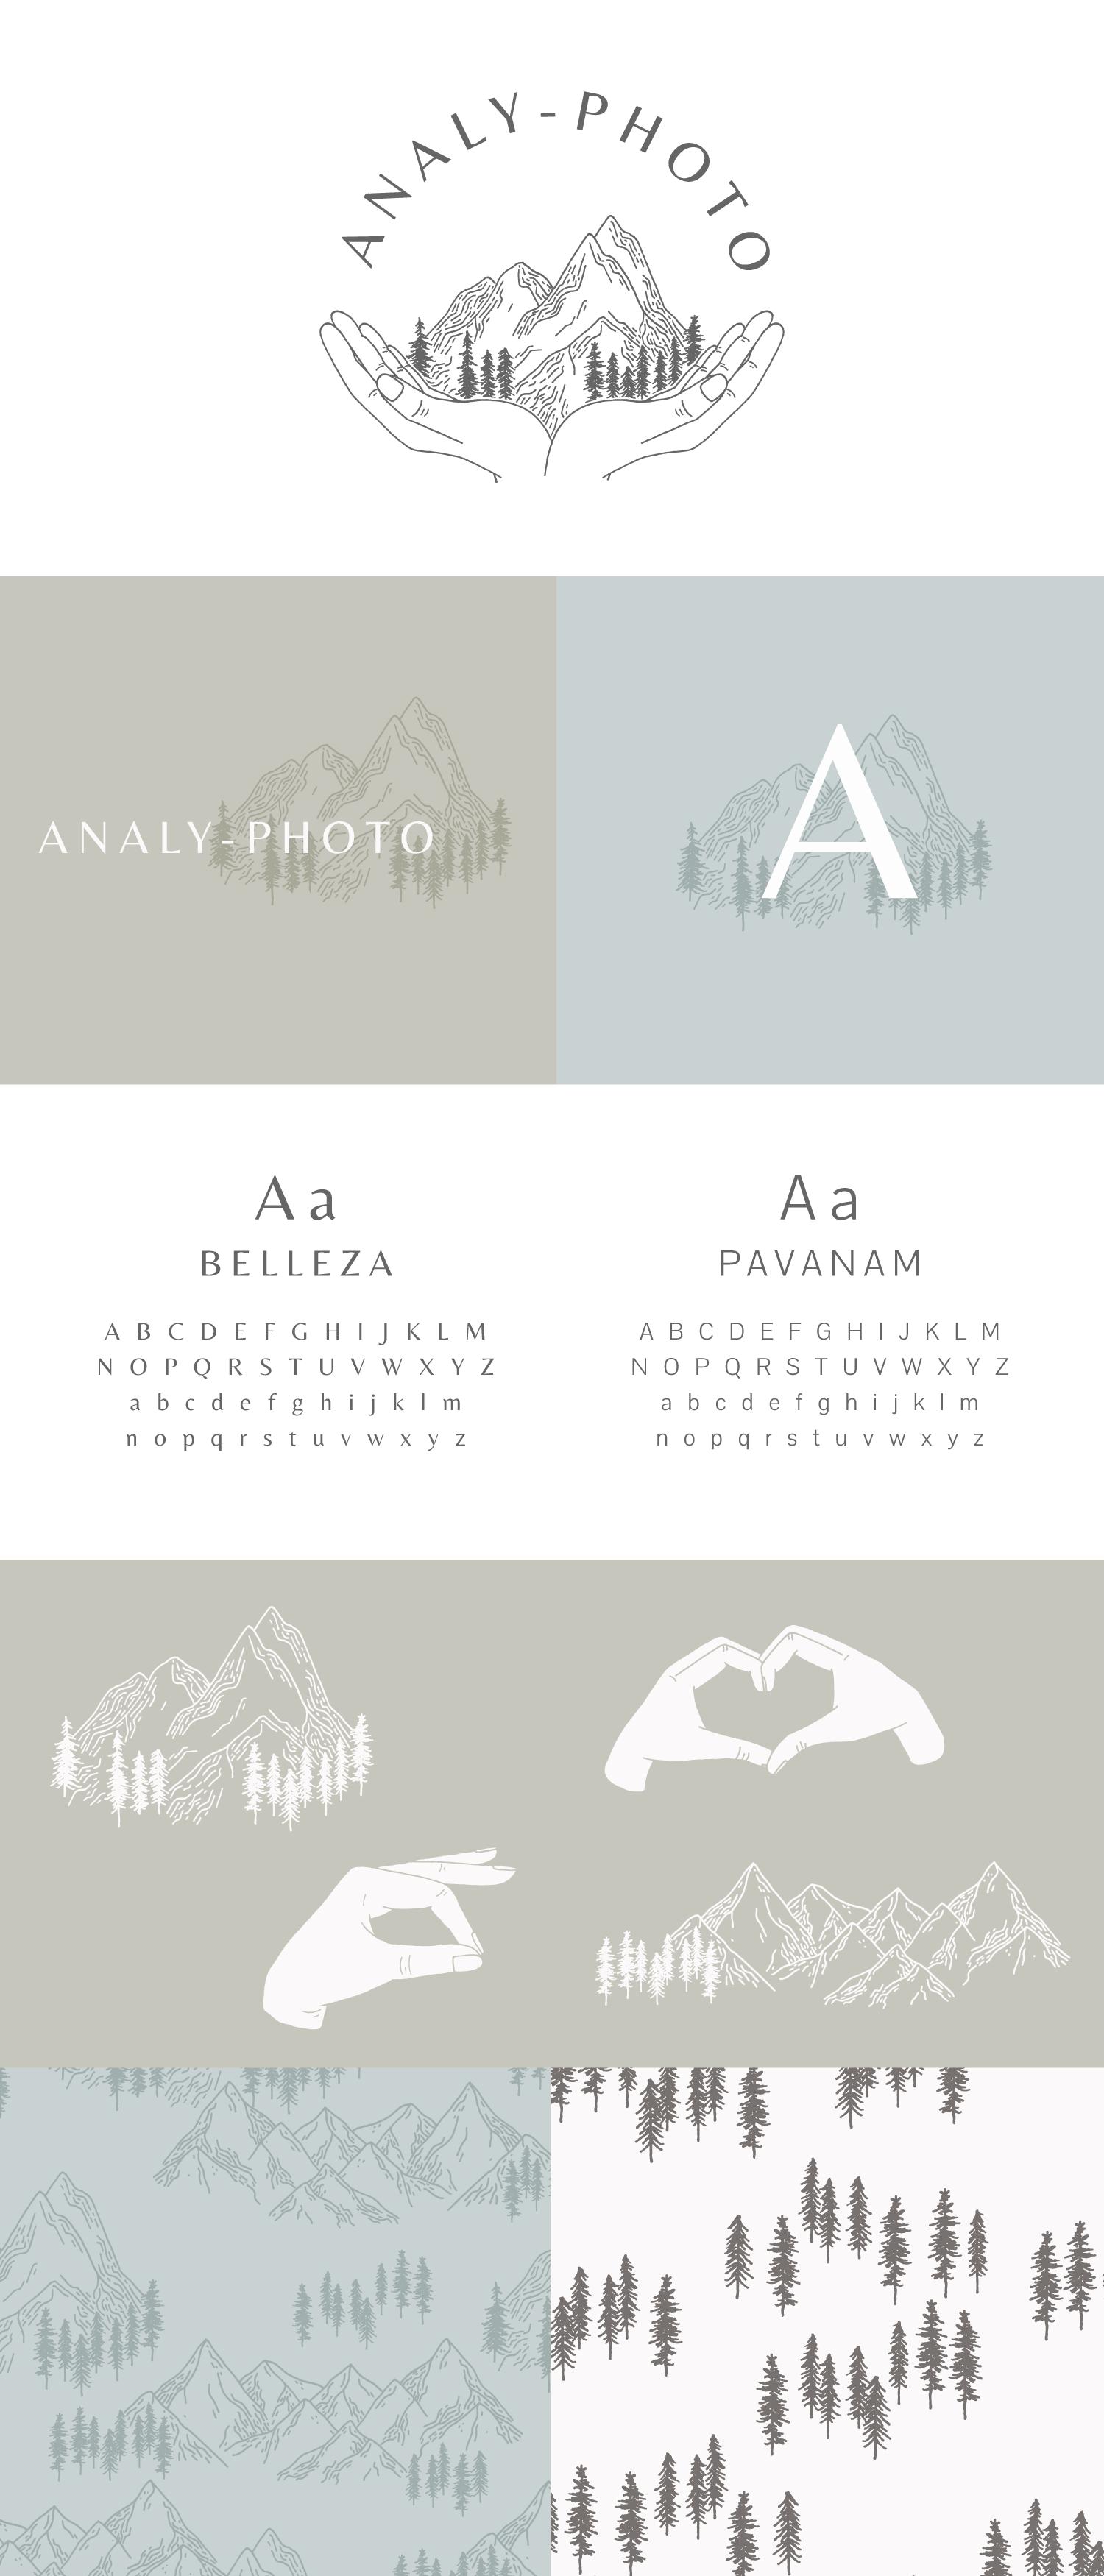 Analy-Photo - Logo & Branding design - Bea & Bloom Creative Design Studio